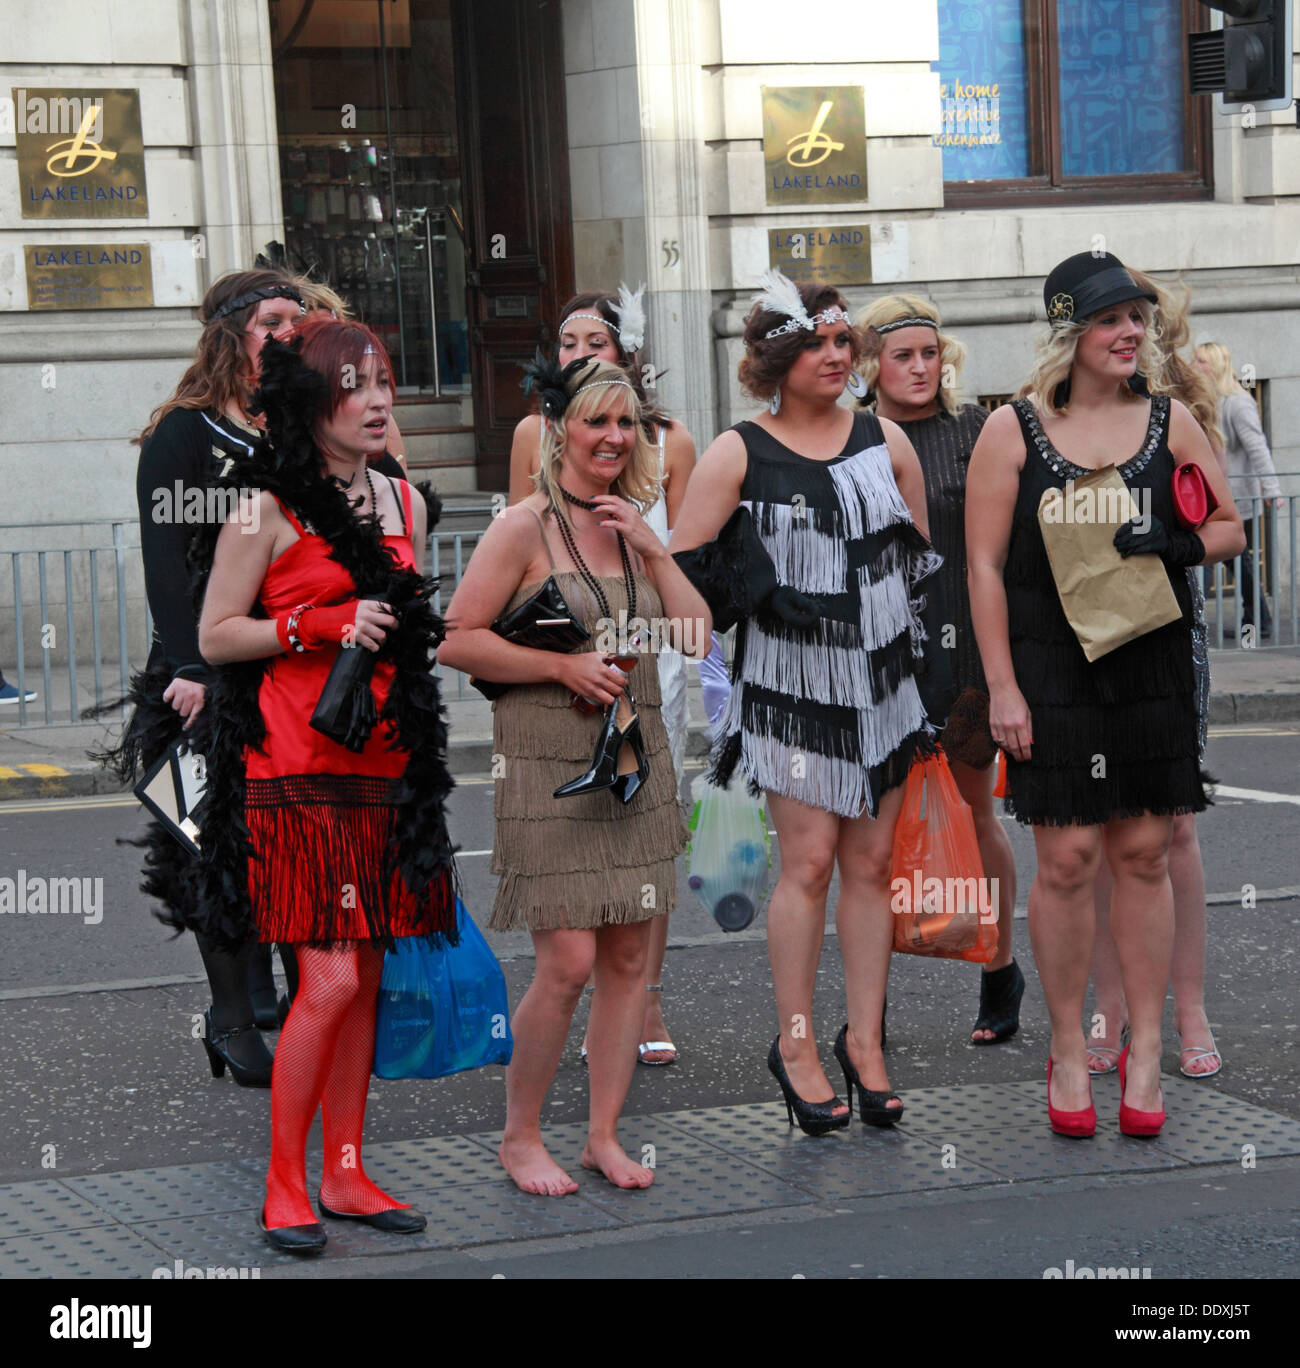 Popular location, Hen Party in George St, Edinburgh, Scotland, UK - Stock Image